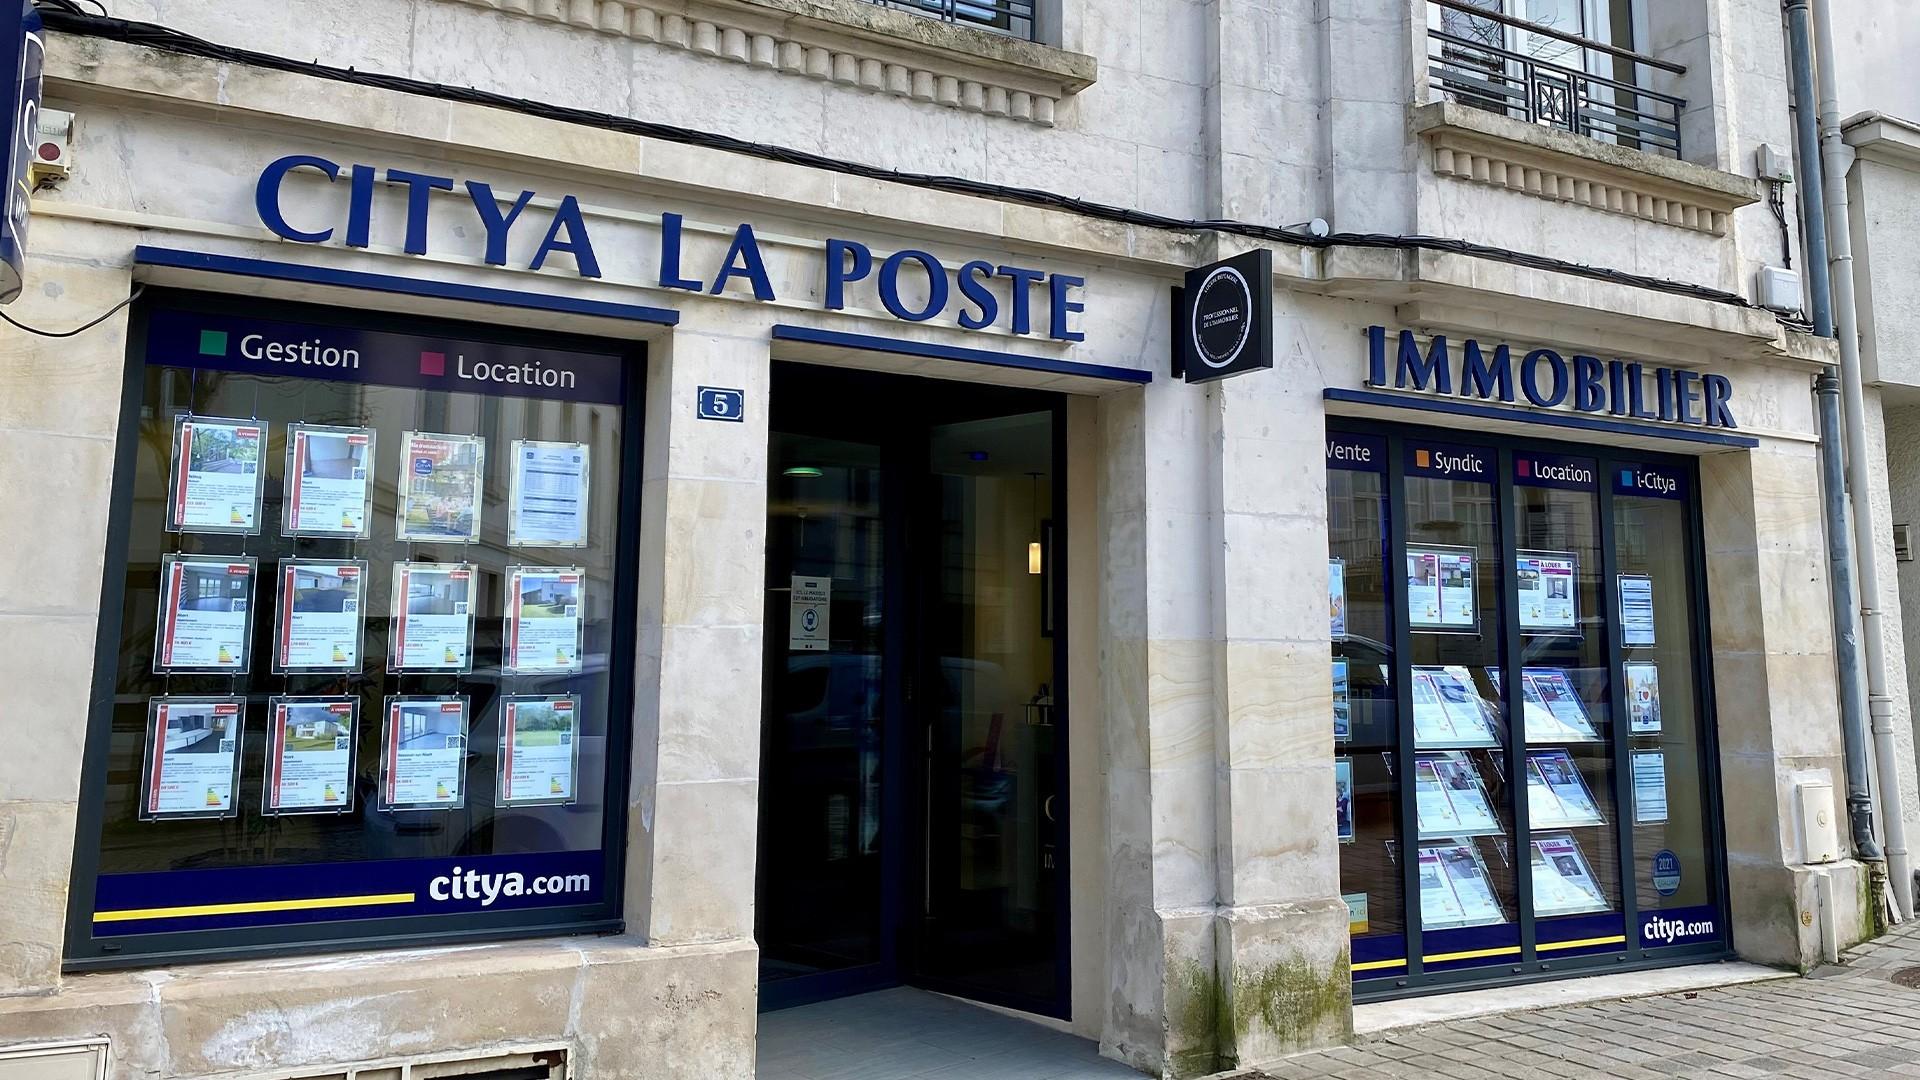 Agence immo Citya Immobilier La Poste